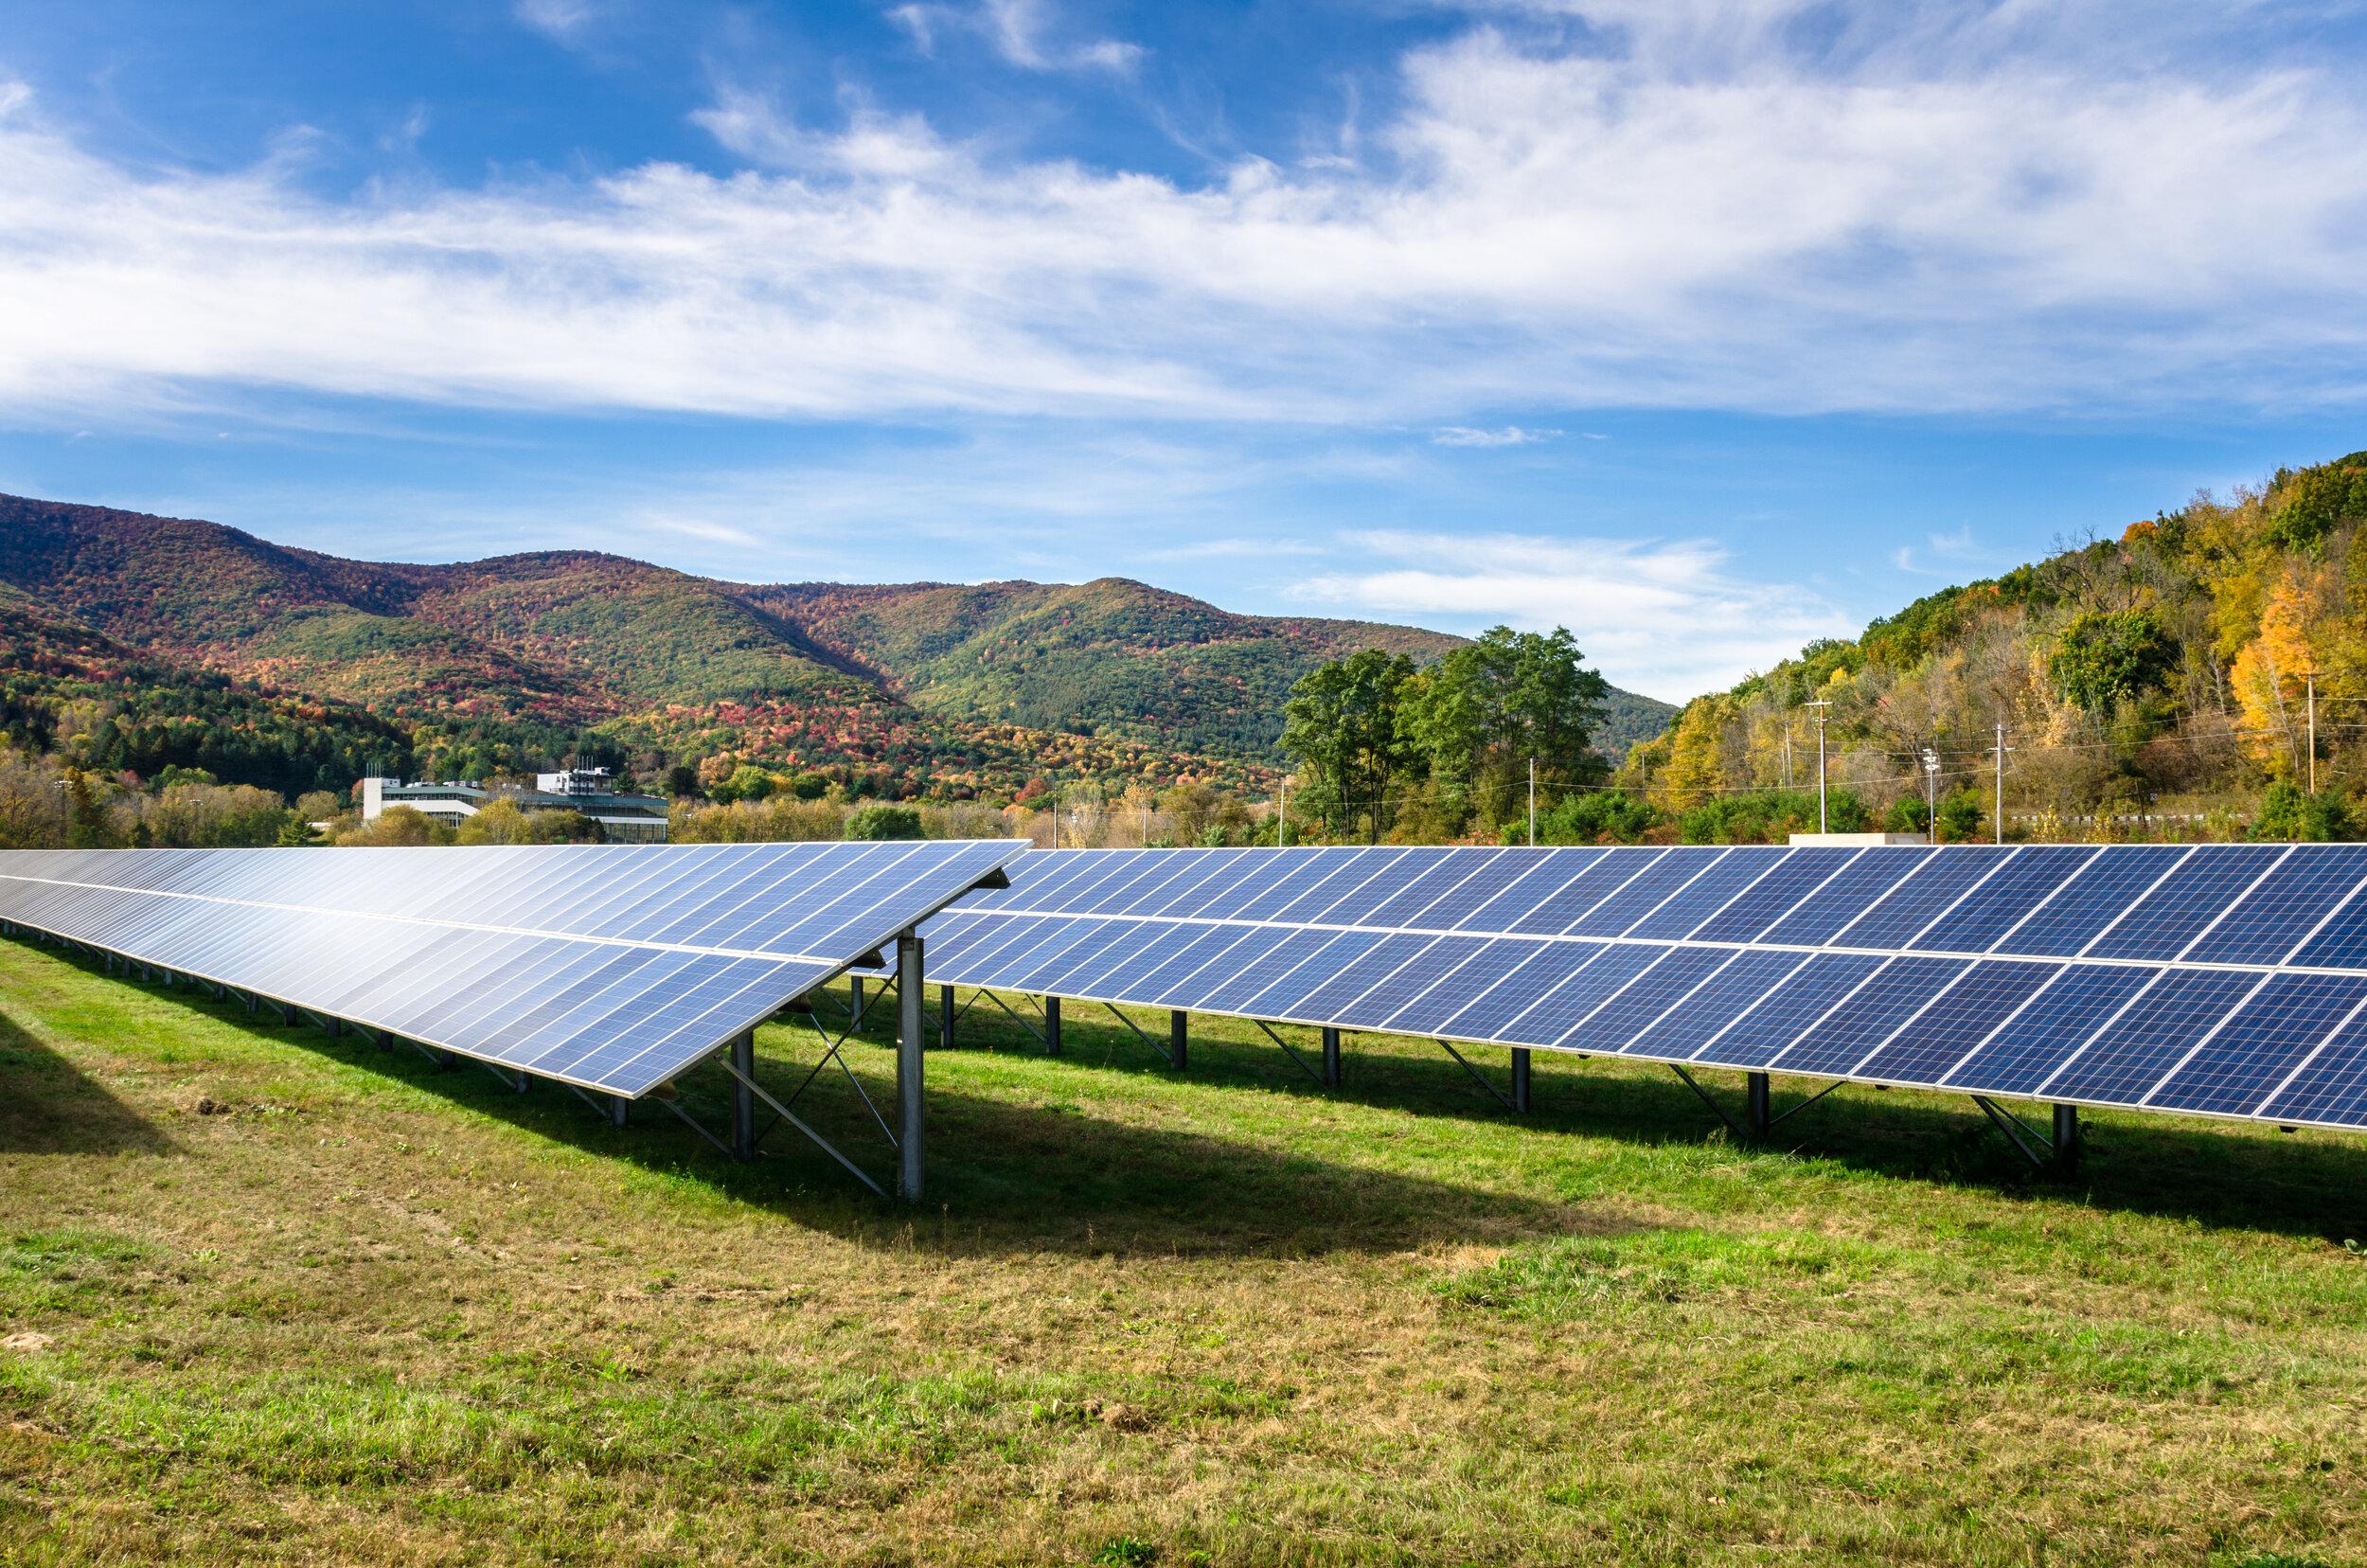 solar field Depositphotos_149800136_xl-2015.jpg